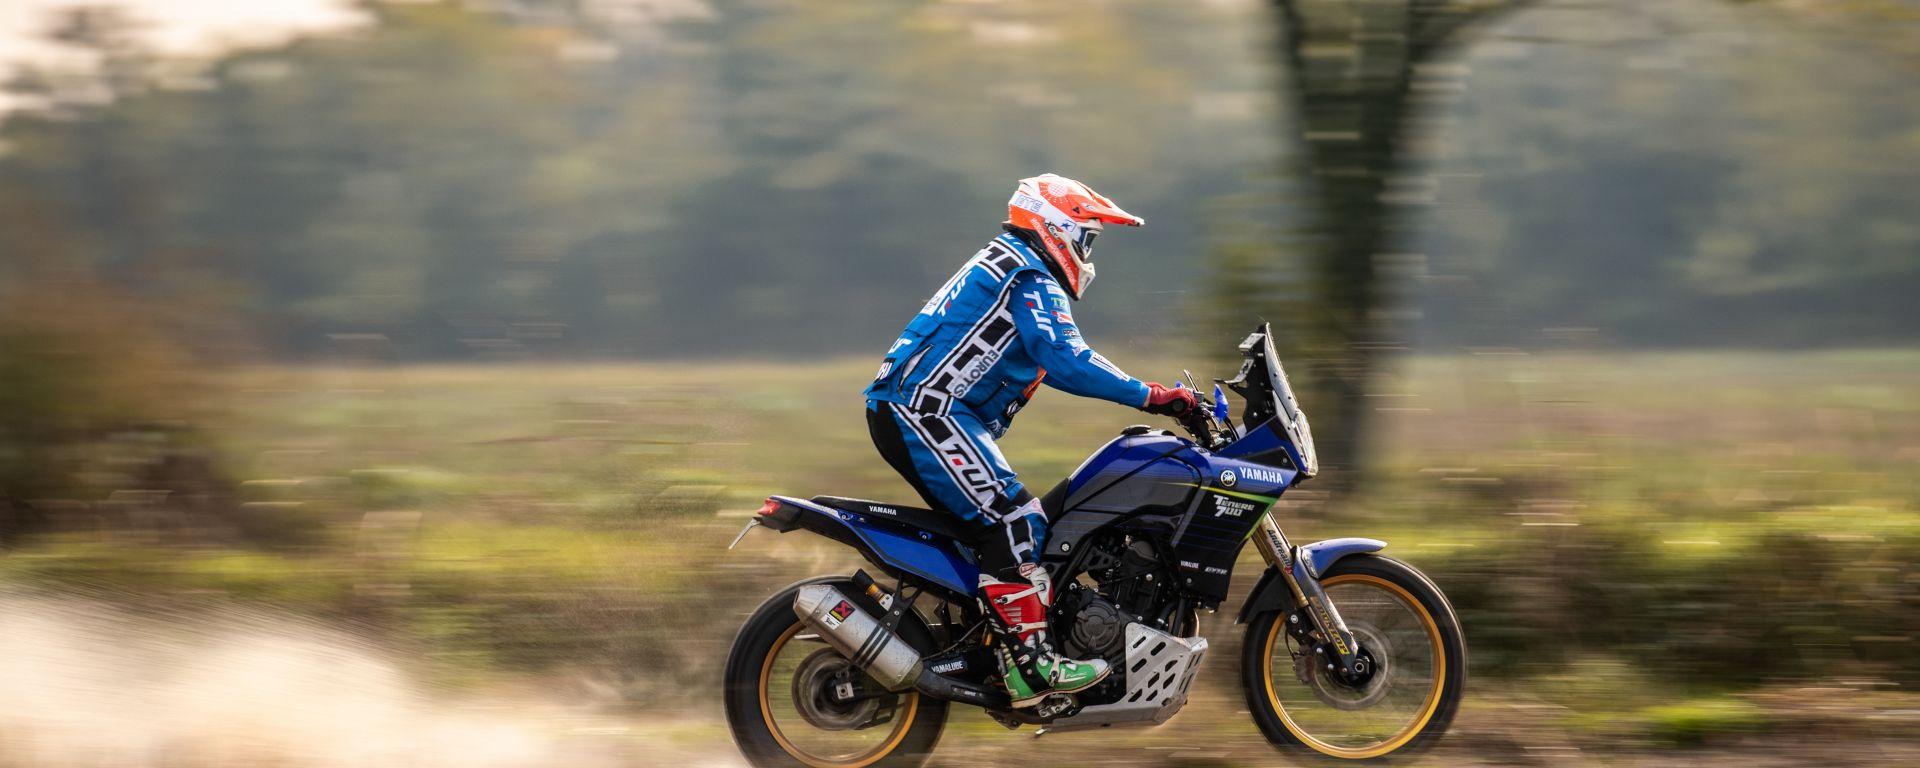 Yamaha Ténéré Challenge, l'animo racing della Ténéré